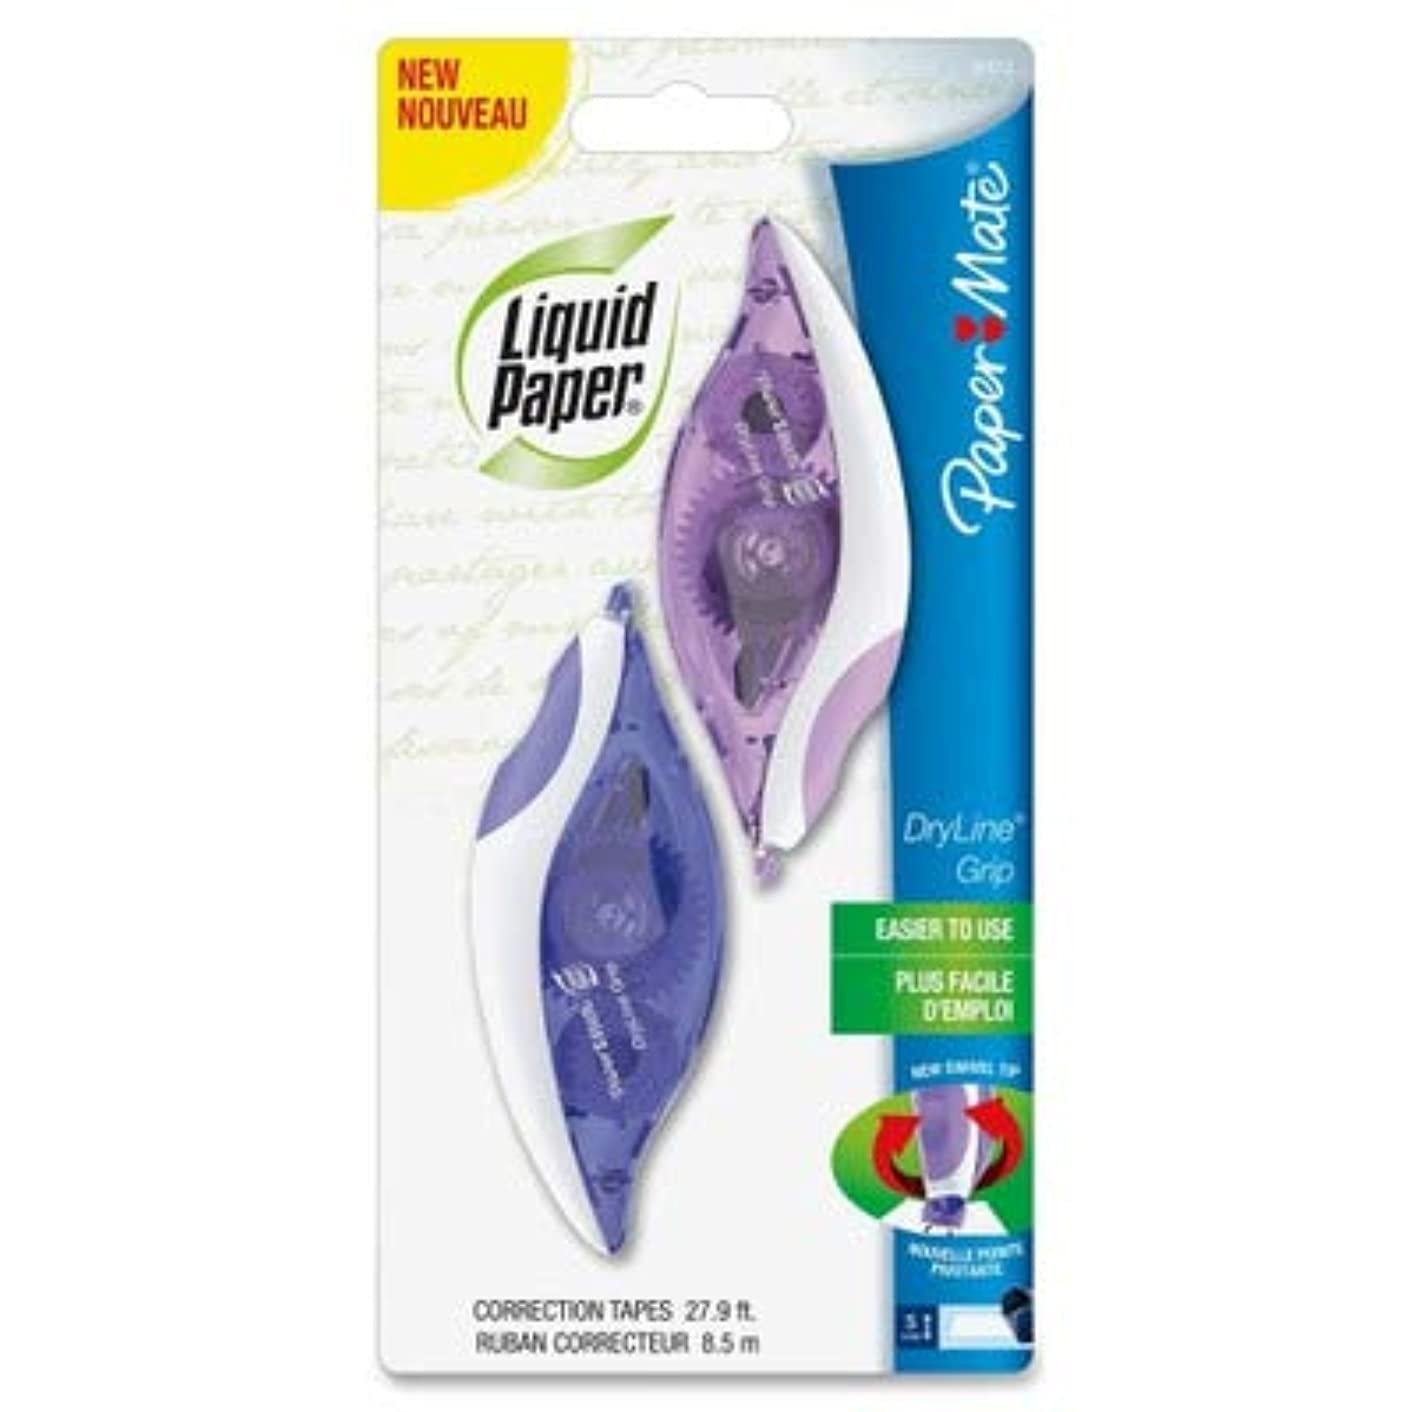 PAPERMATE 87813 DryLine Grip Correction Tape, 1/5quot; x 335quot, Blue/Purple Dispensers, 2/Pack